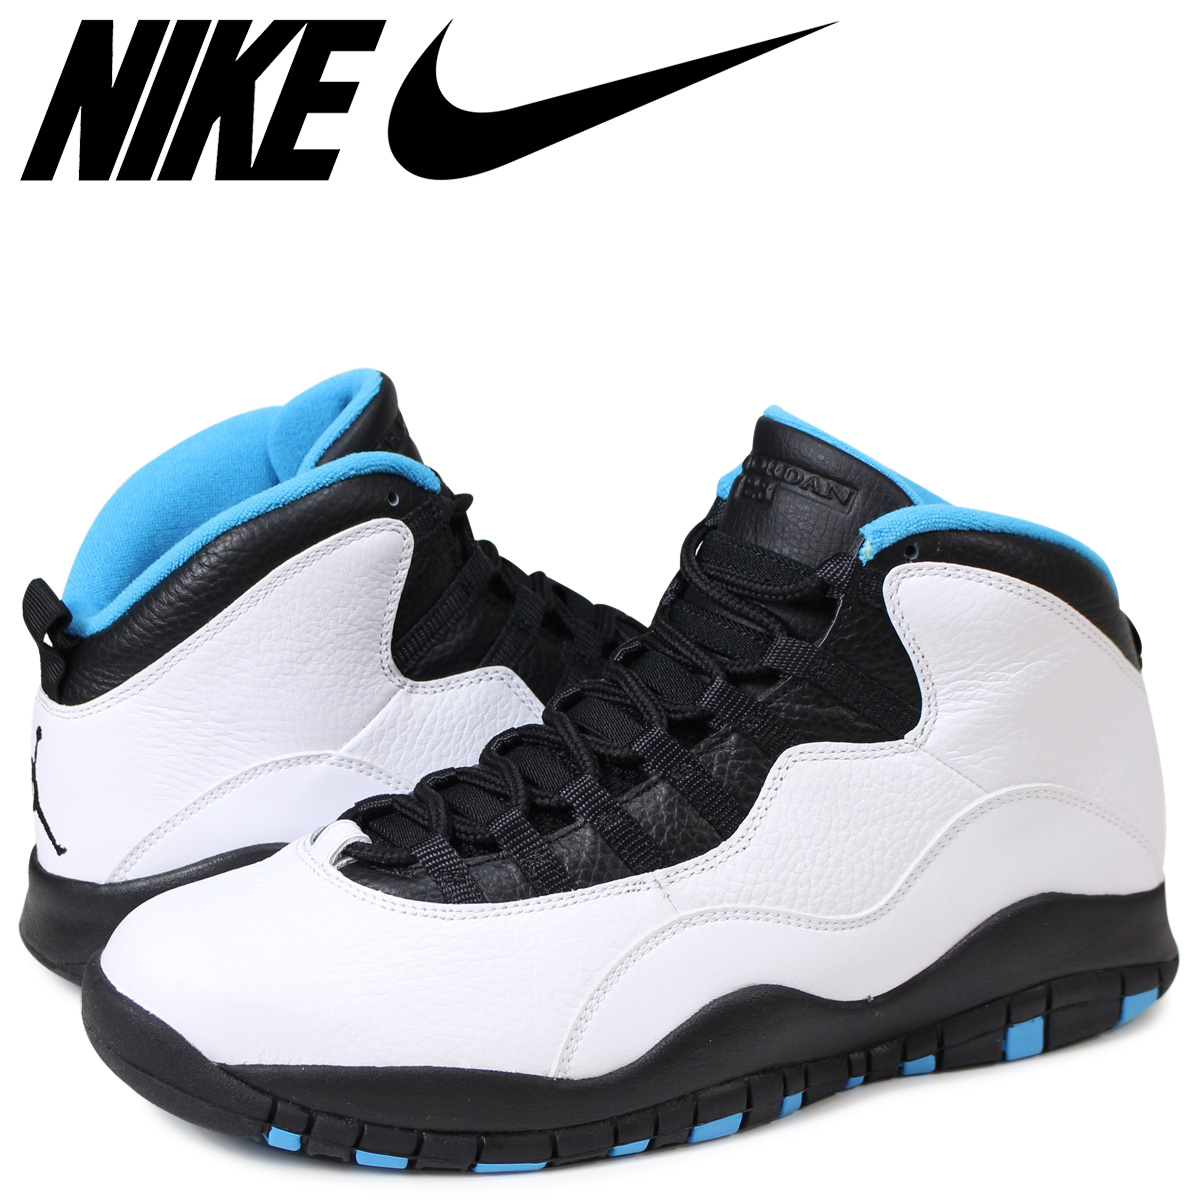 wholesale dealer 3e23b d80d7 Nike NIKE Air Jordan 10 nostalgic sneakers AIR JORDAN 10 RETRO black black  310,805-106